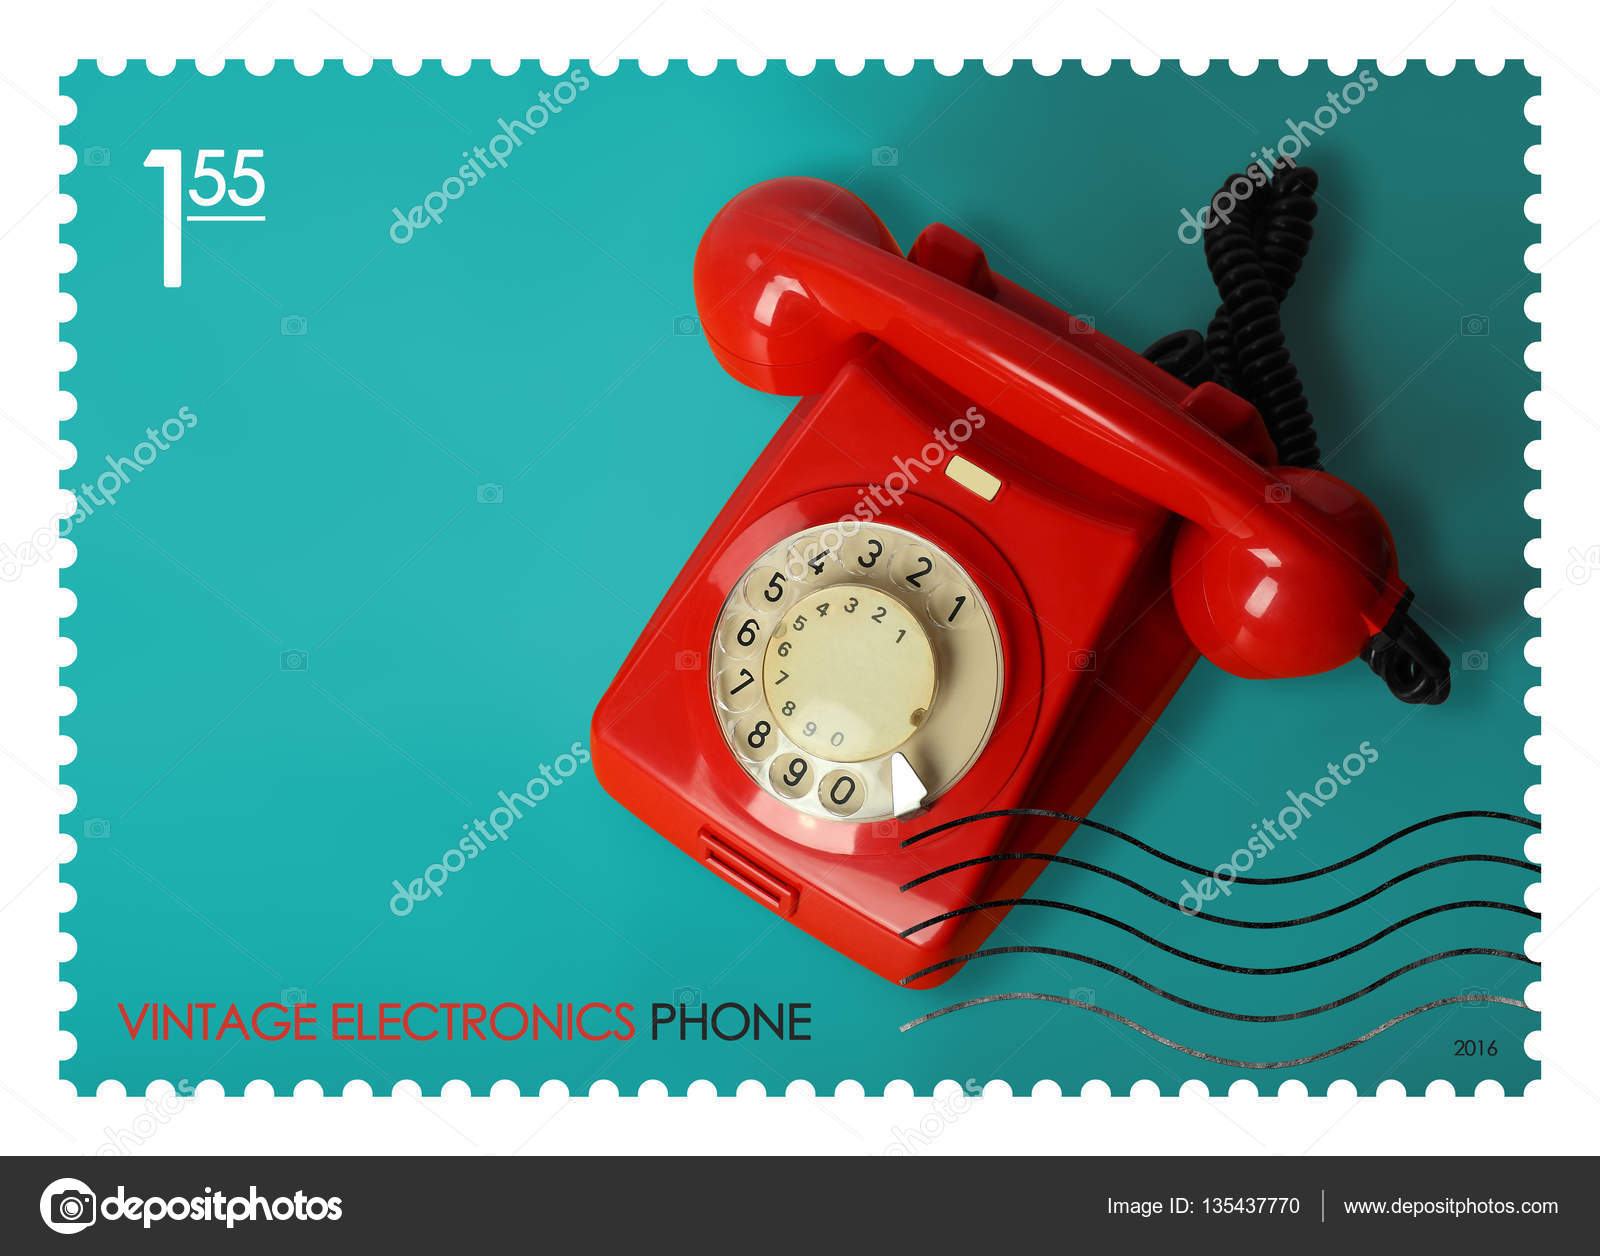 Sello de correos tel fono retro foto de stock for Telefono oficina de correos